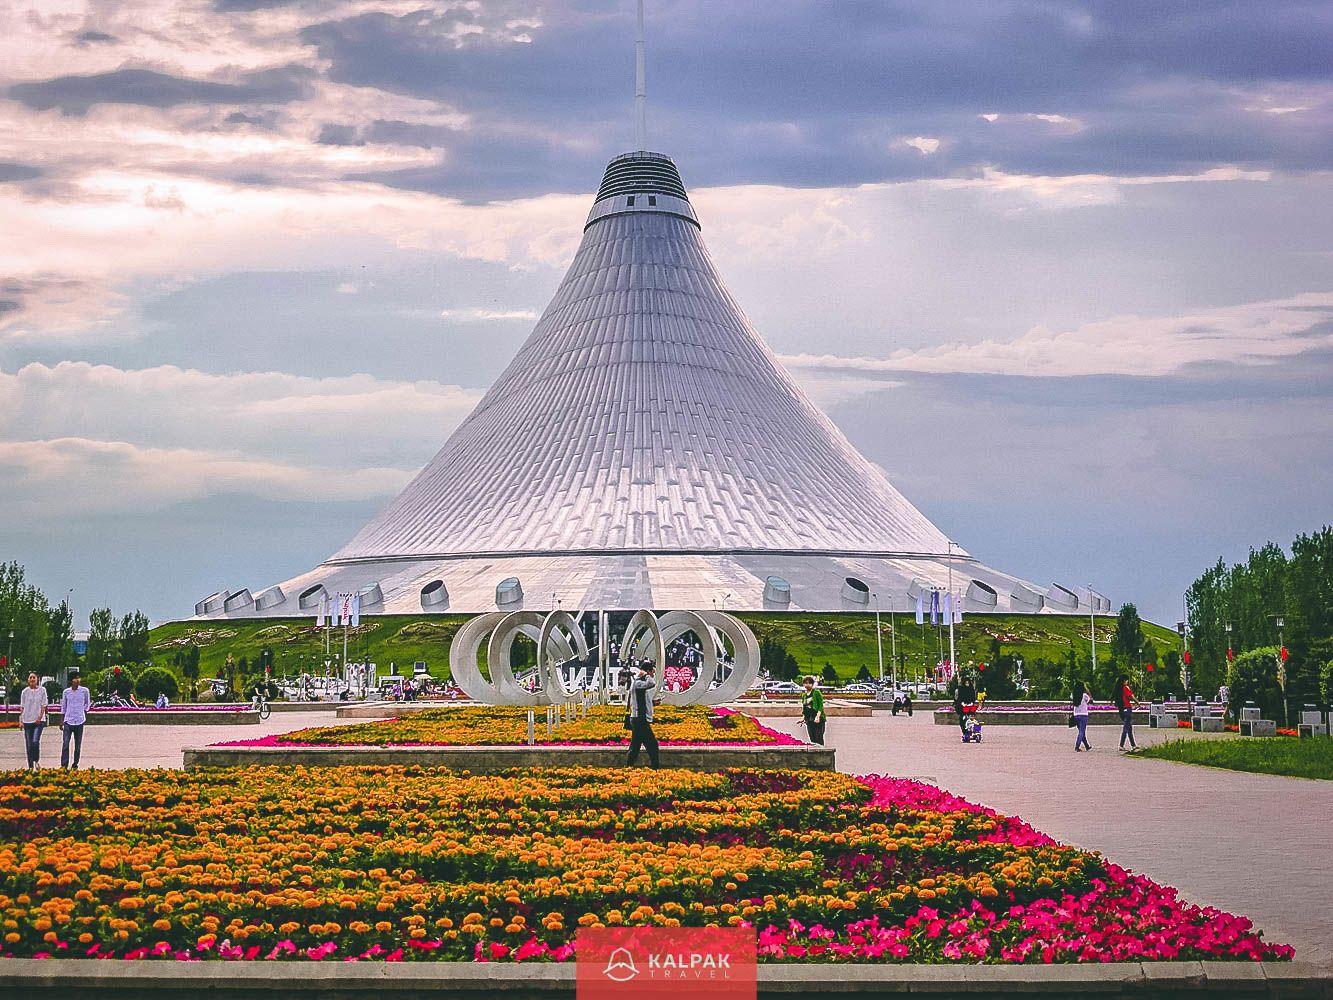 Central Asian capitals, Astana city